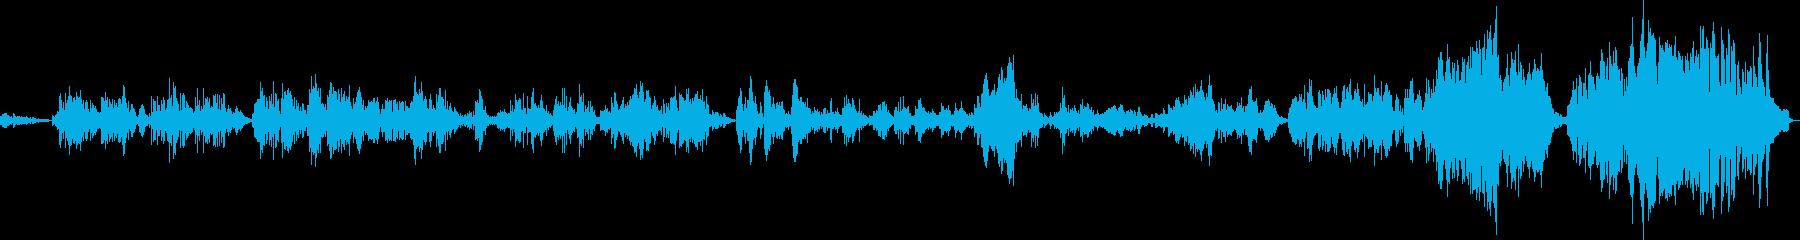 F・リスト:ラ・カンパネラ(ピアノソロ)の再生済みの波形